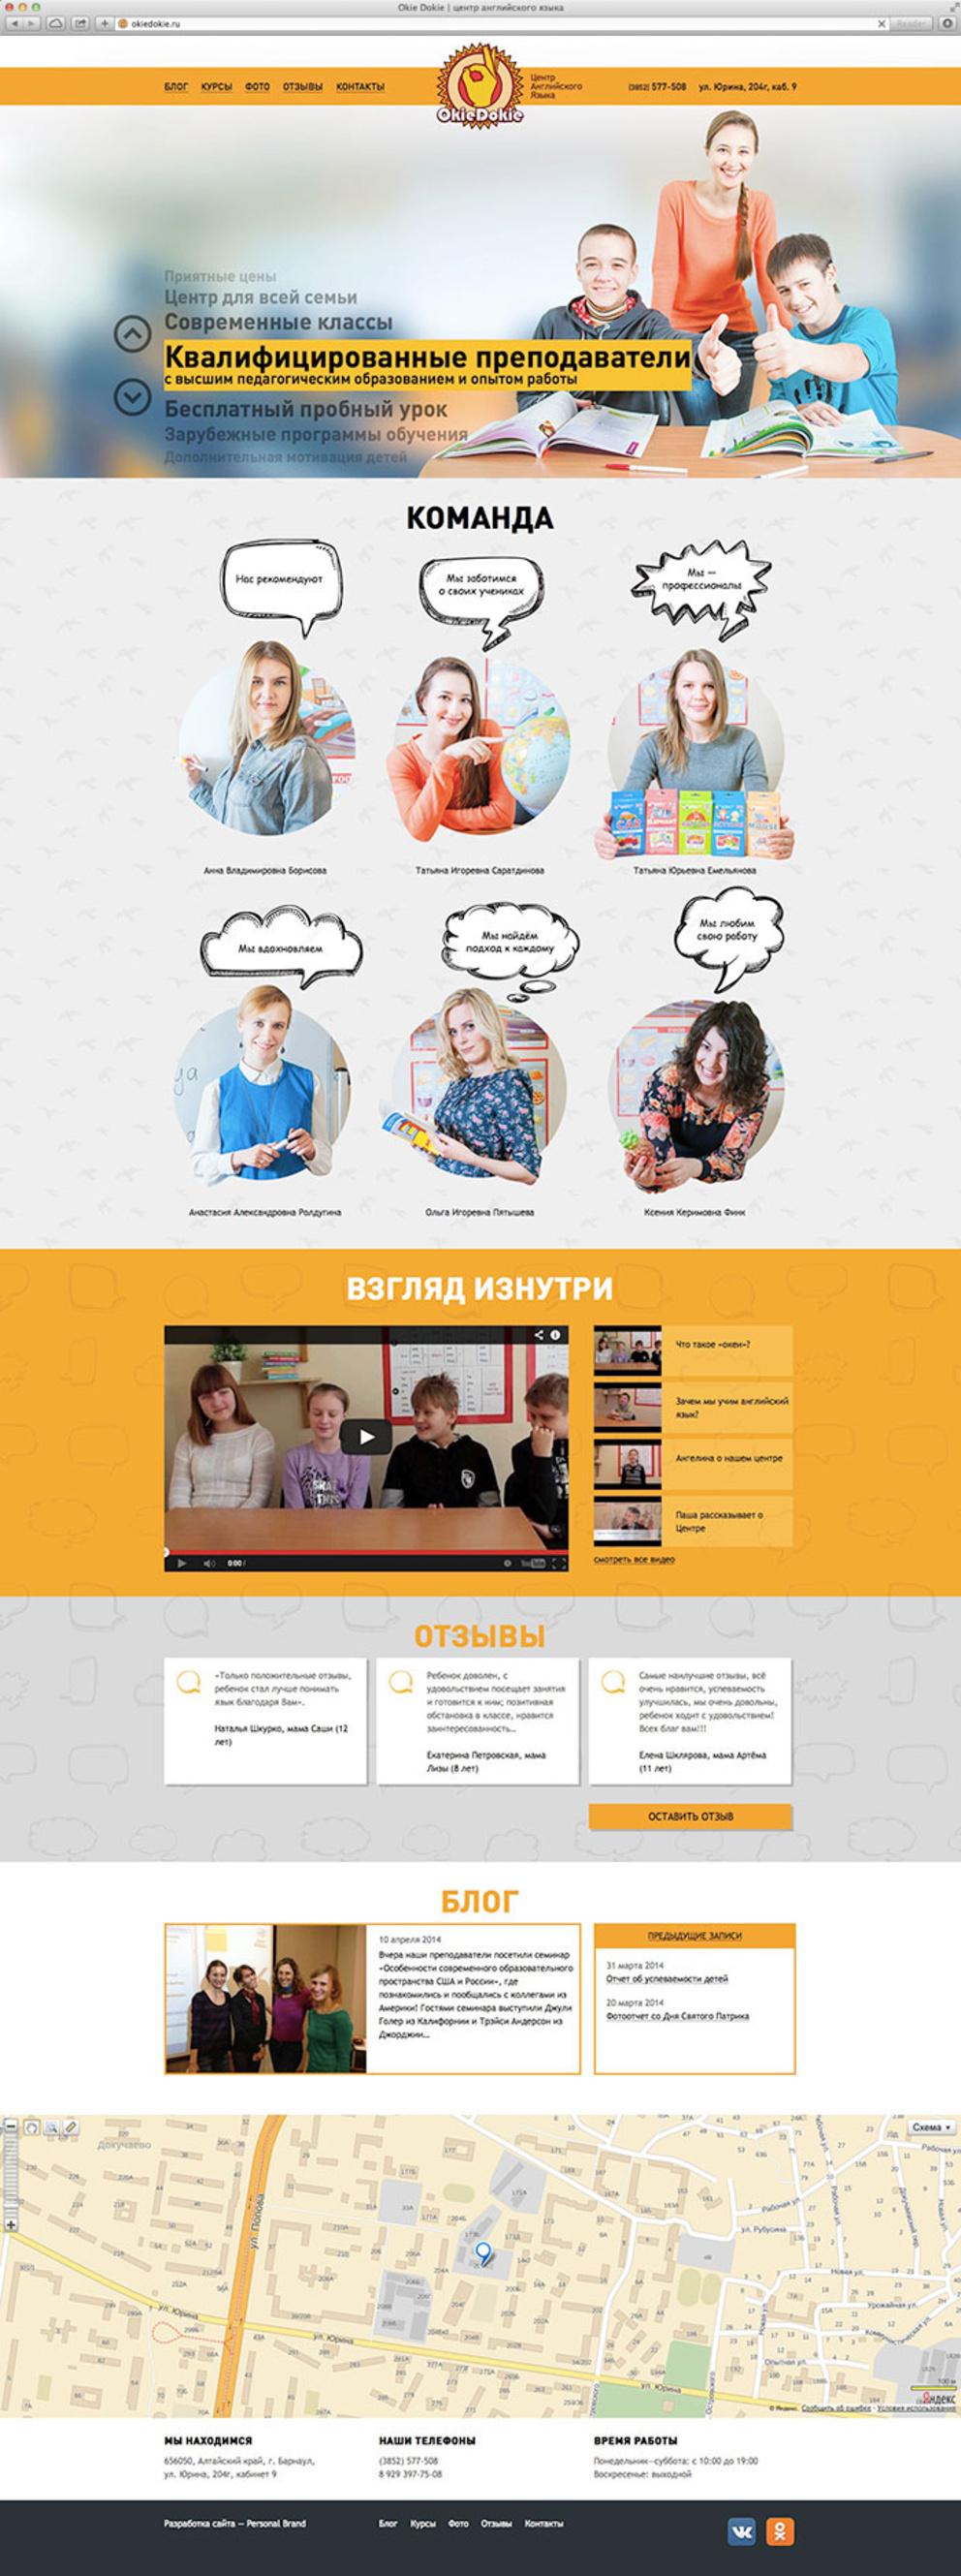 Сайт языковой школы OkieDokie / Проект компании Интернет-студия Свитер